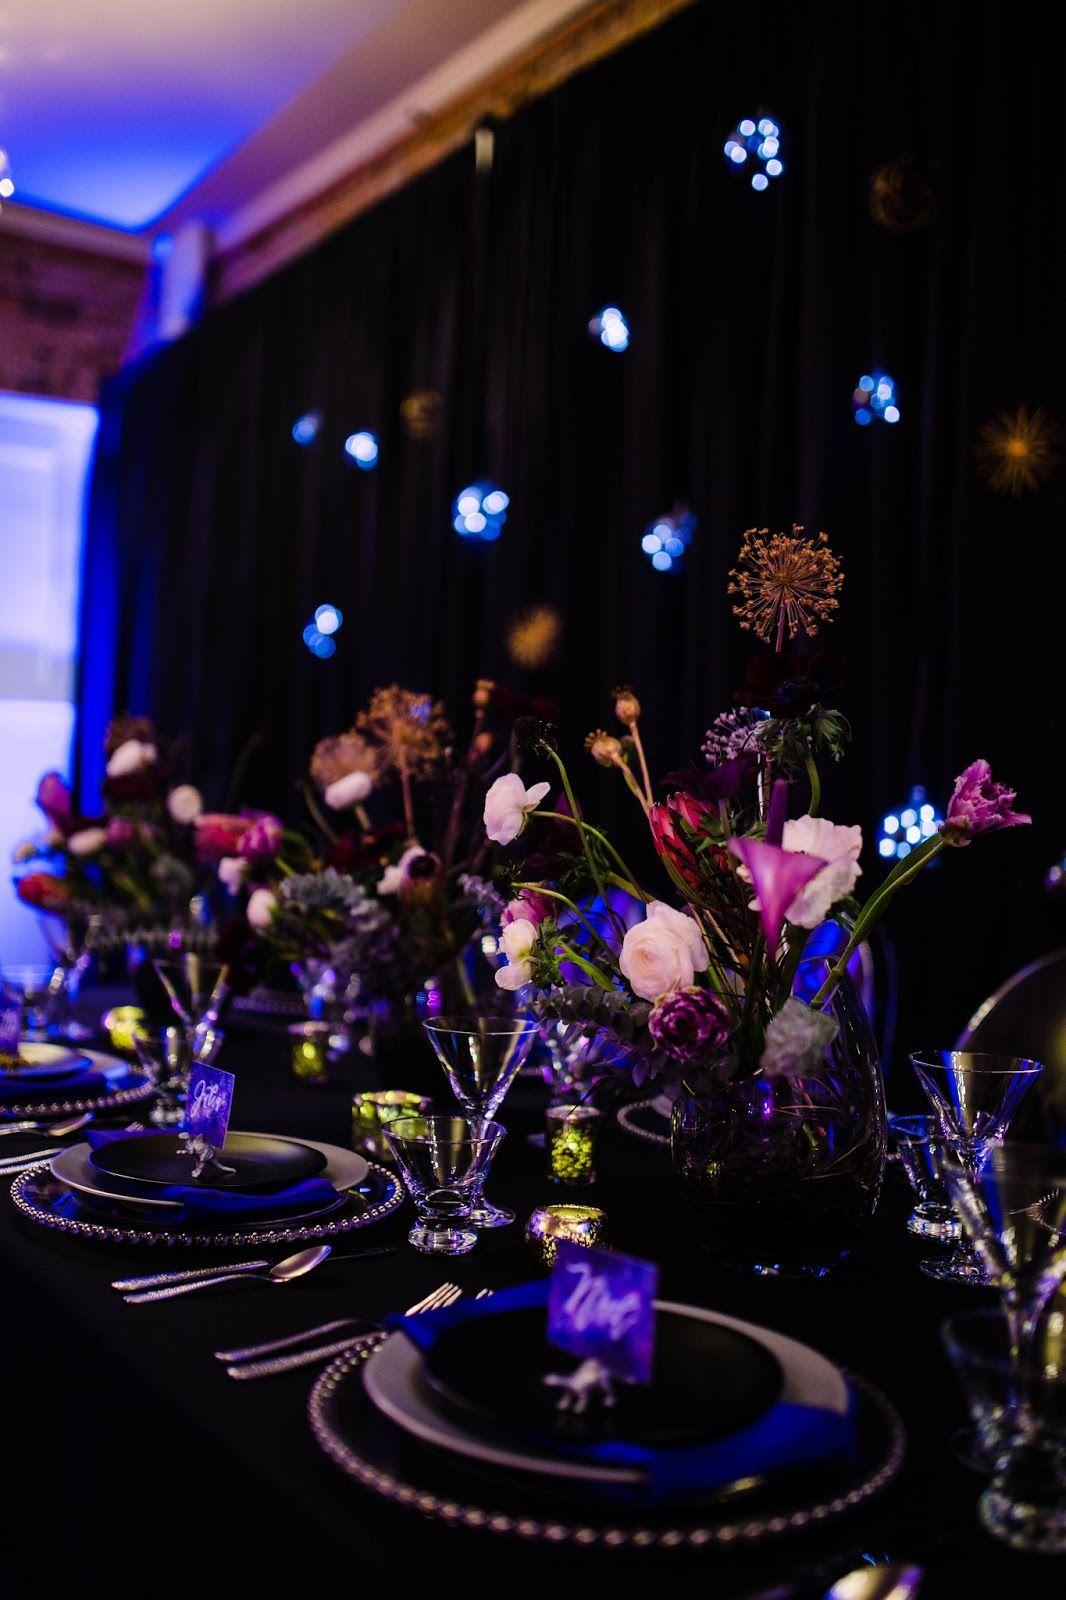 Weddings In Woodinville 2018 Blue Themed Wedding Winter Wedding